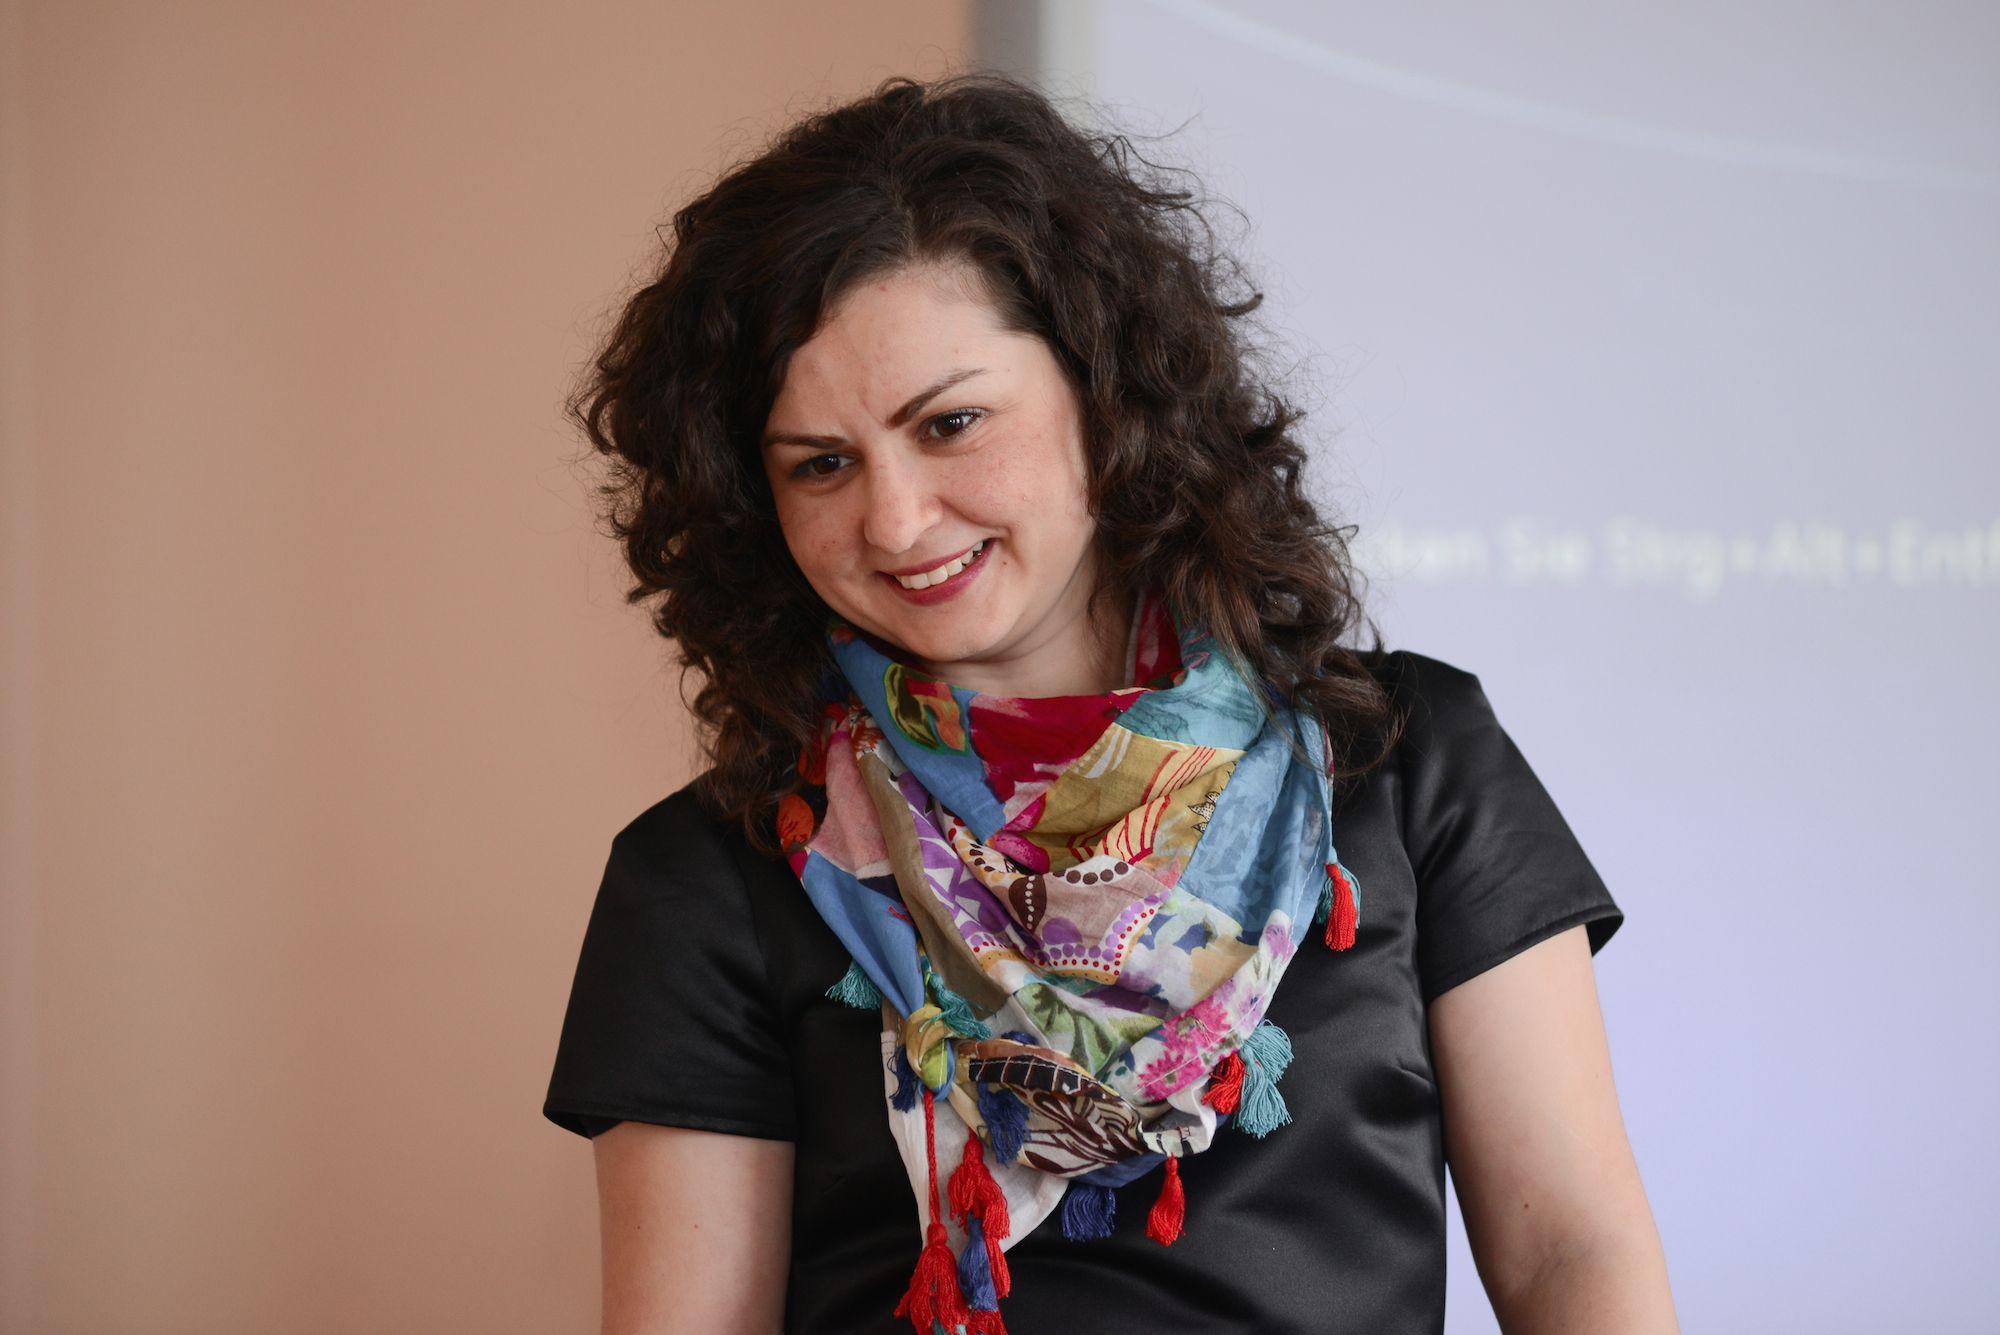 Nailja Agaeva